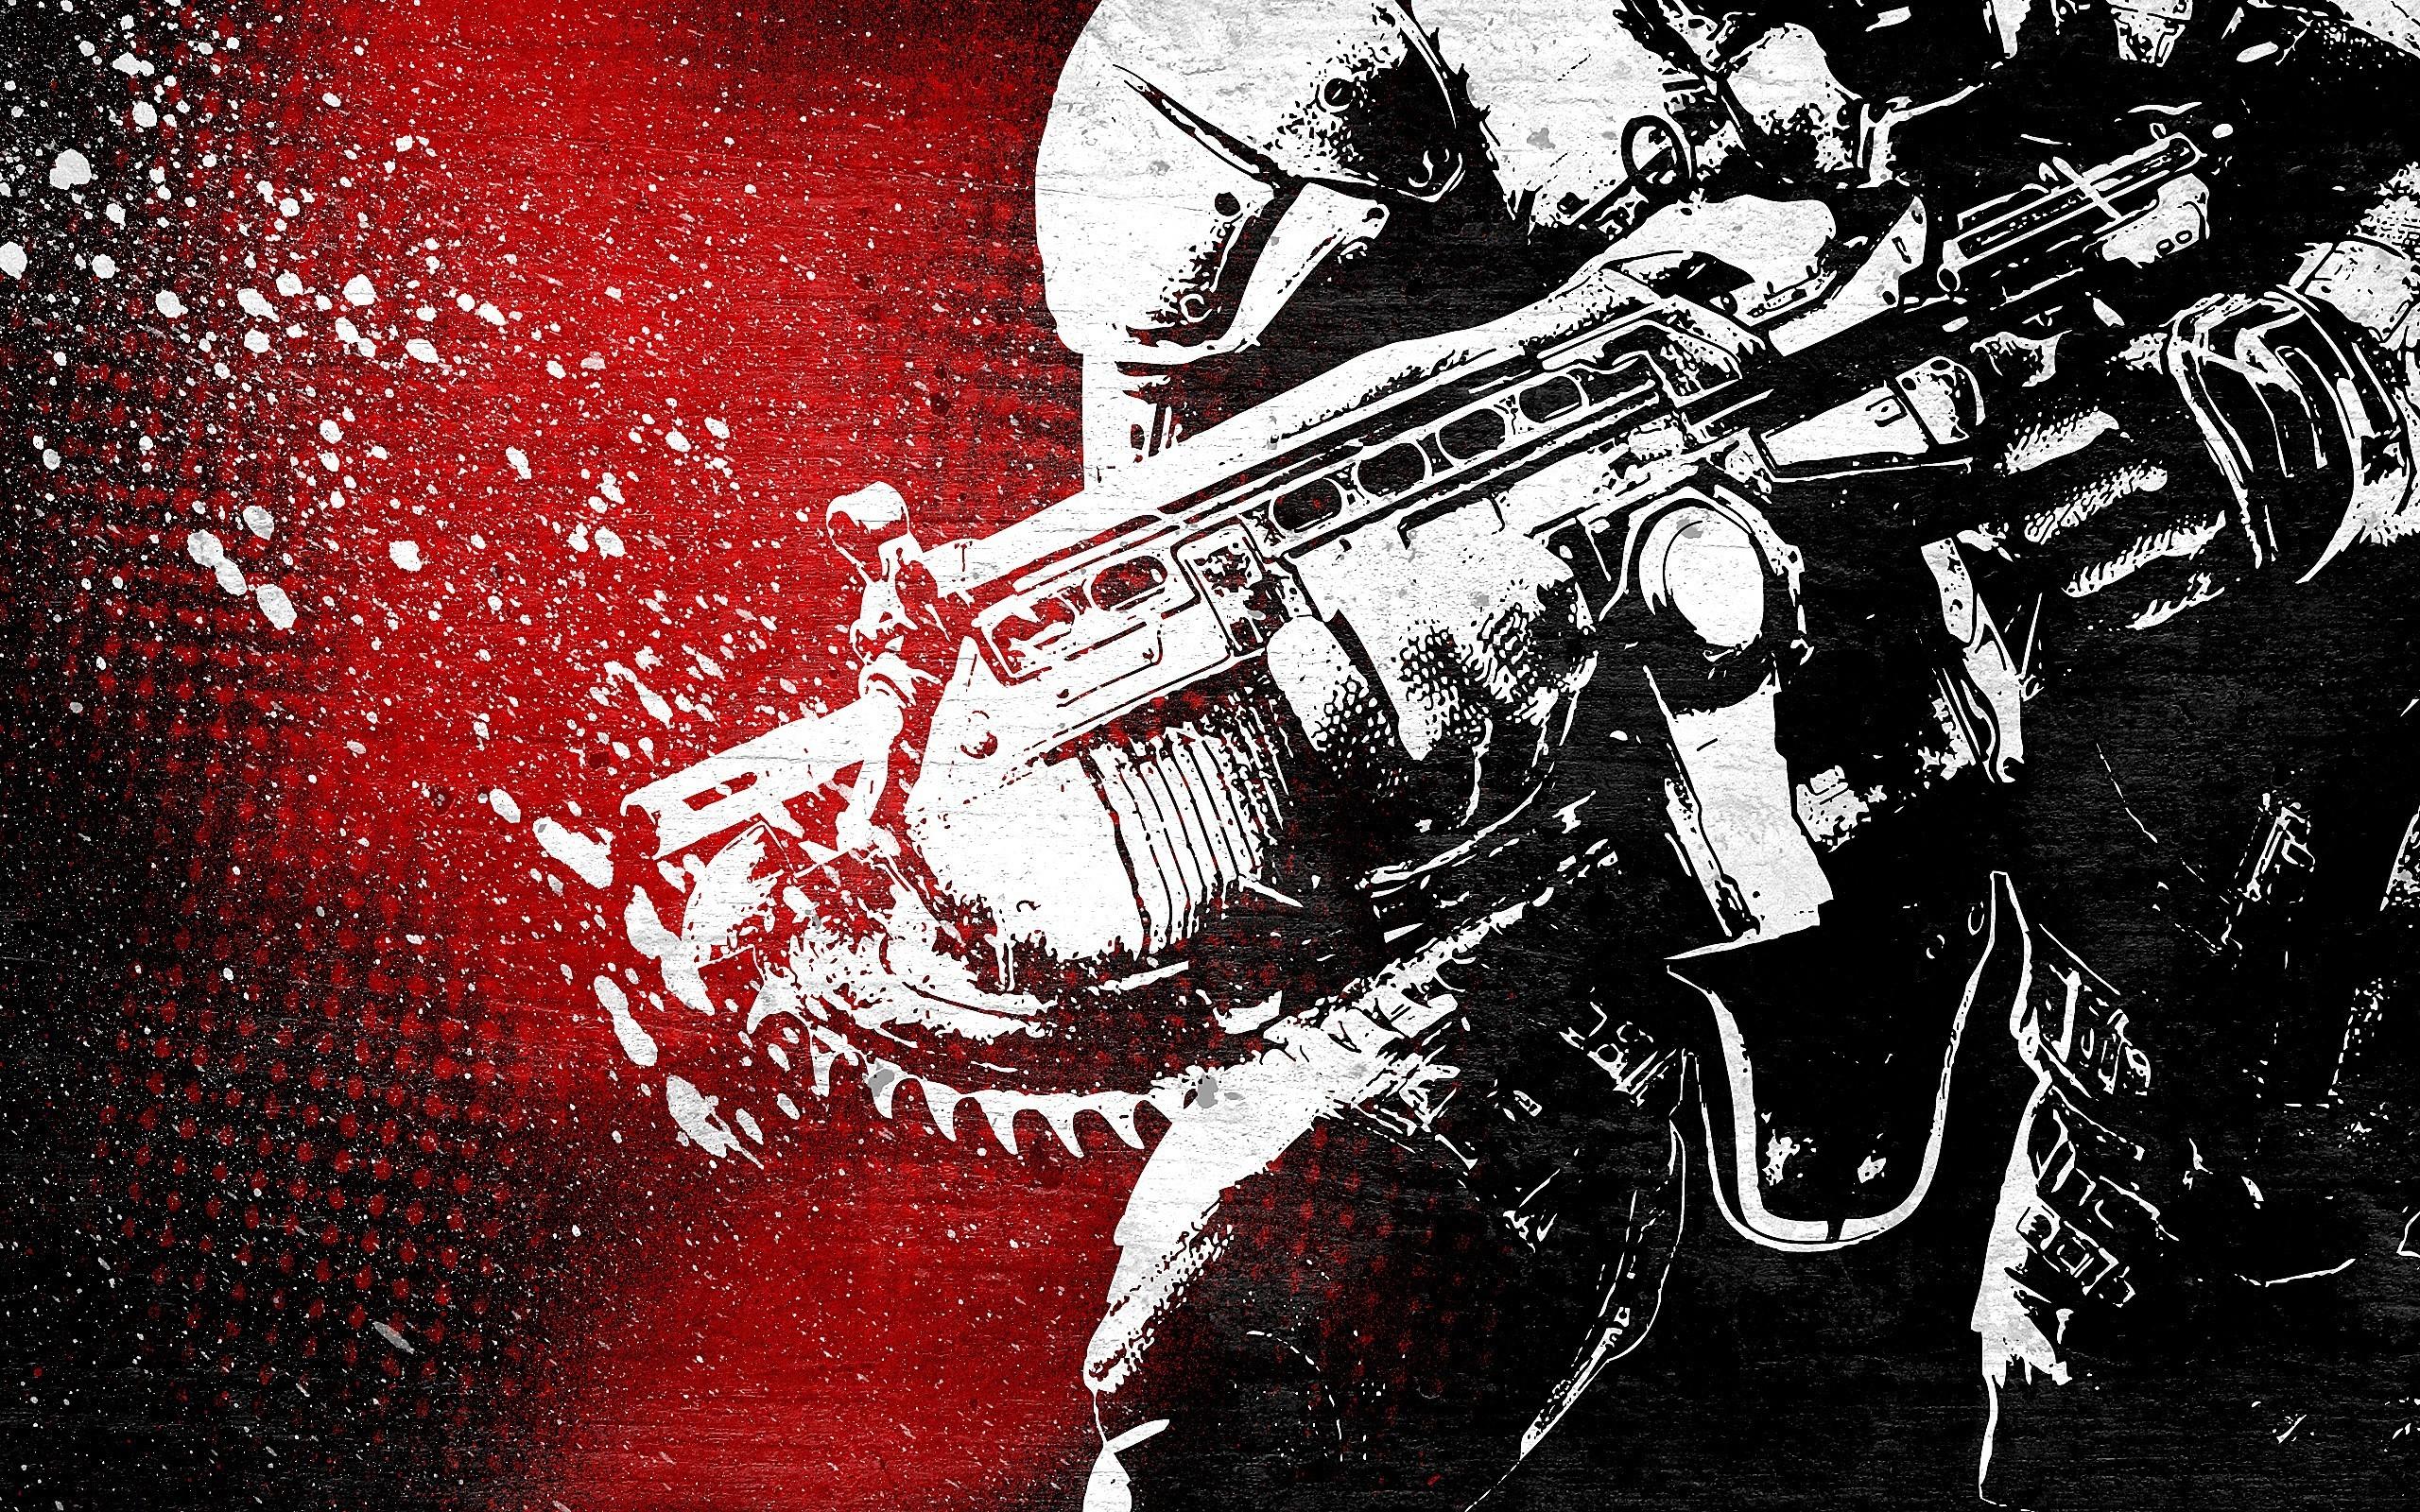 Gears of war hd wallpaper 76 images - Wallpaper gears of war 4 ...